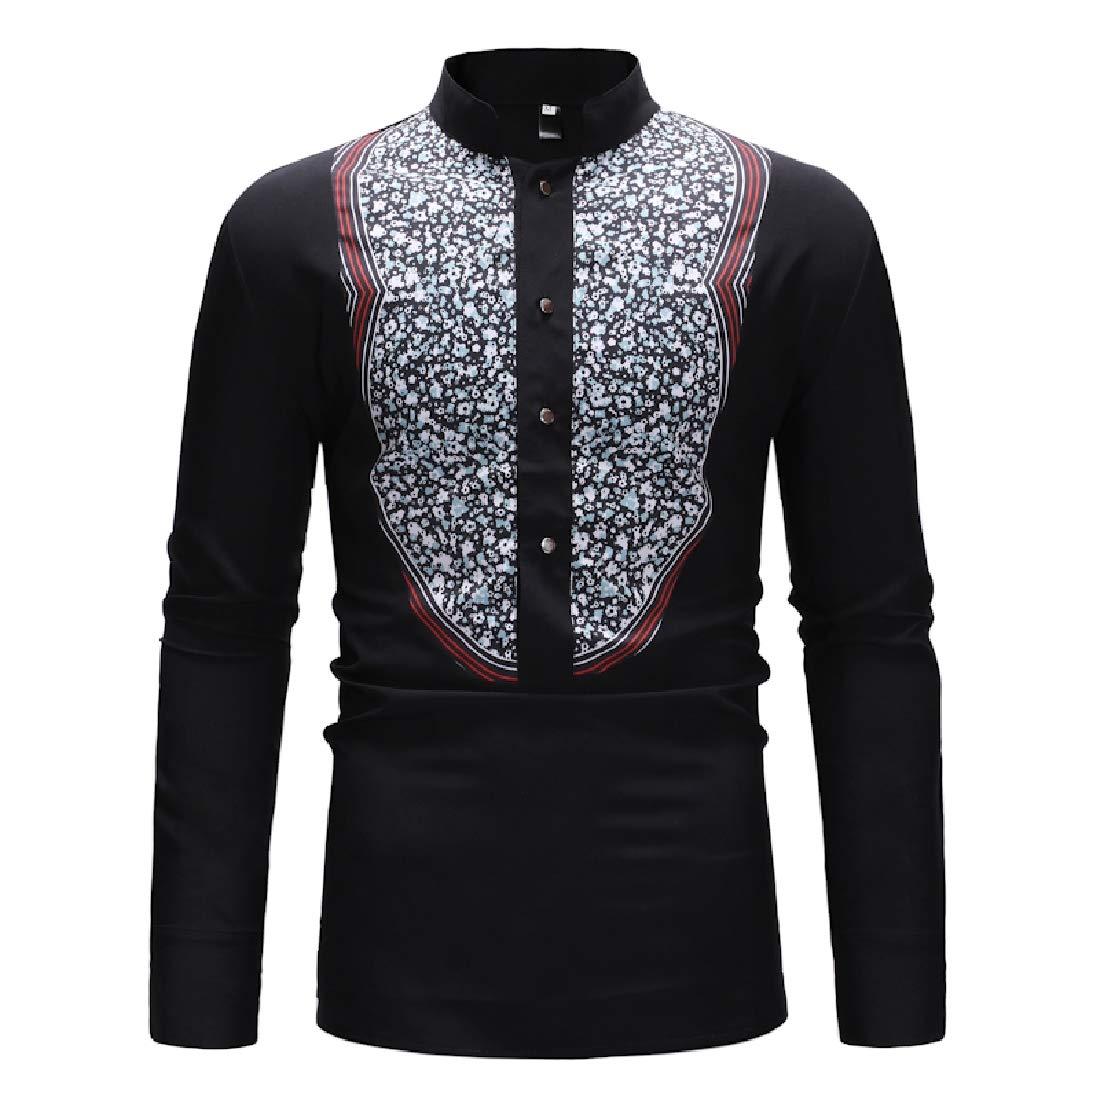 Rrive Men Stand Collar Button Down Classic Dashiki African Print Shirts